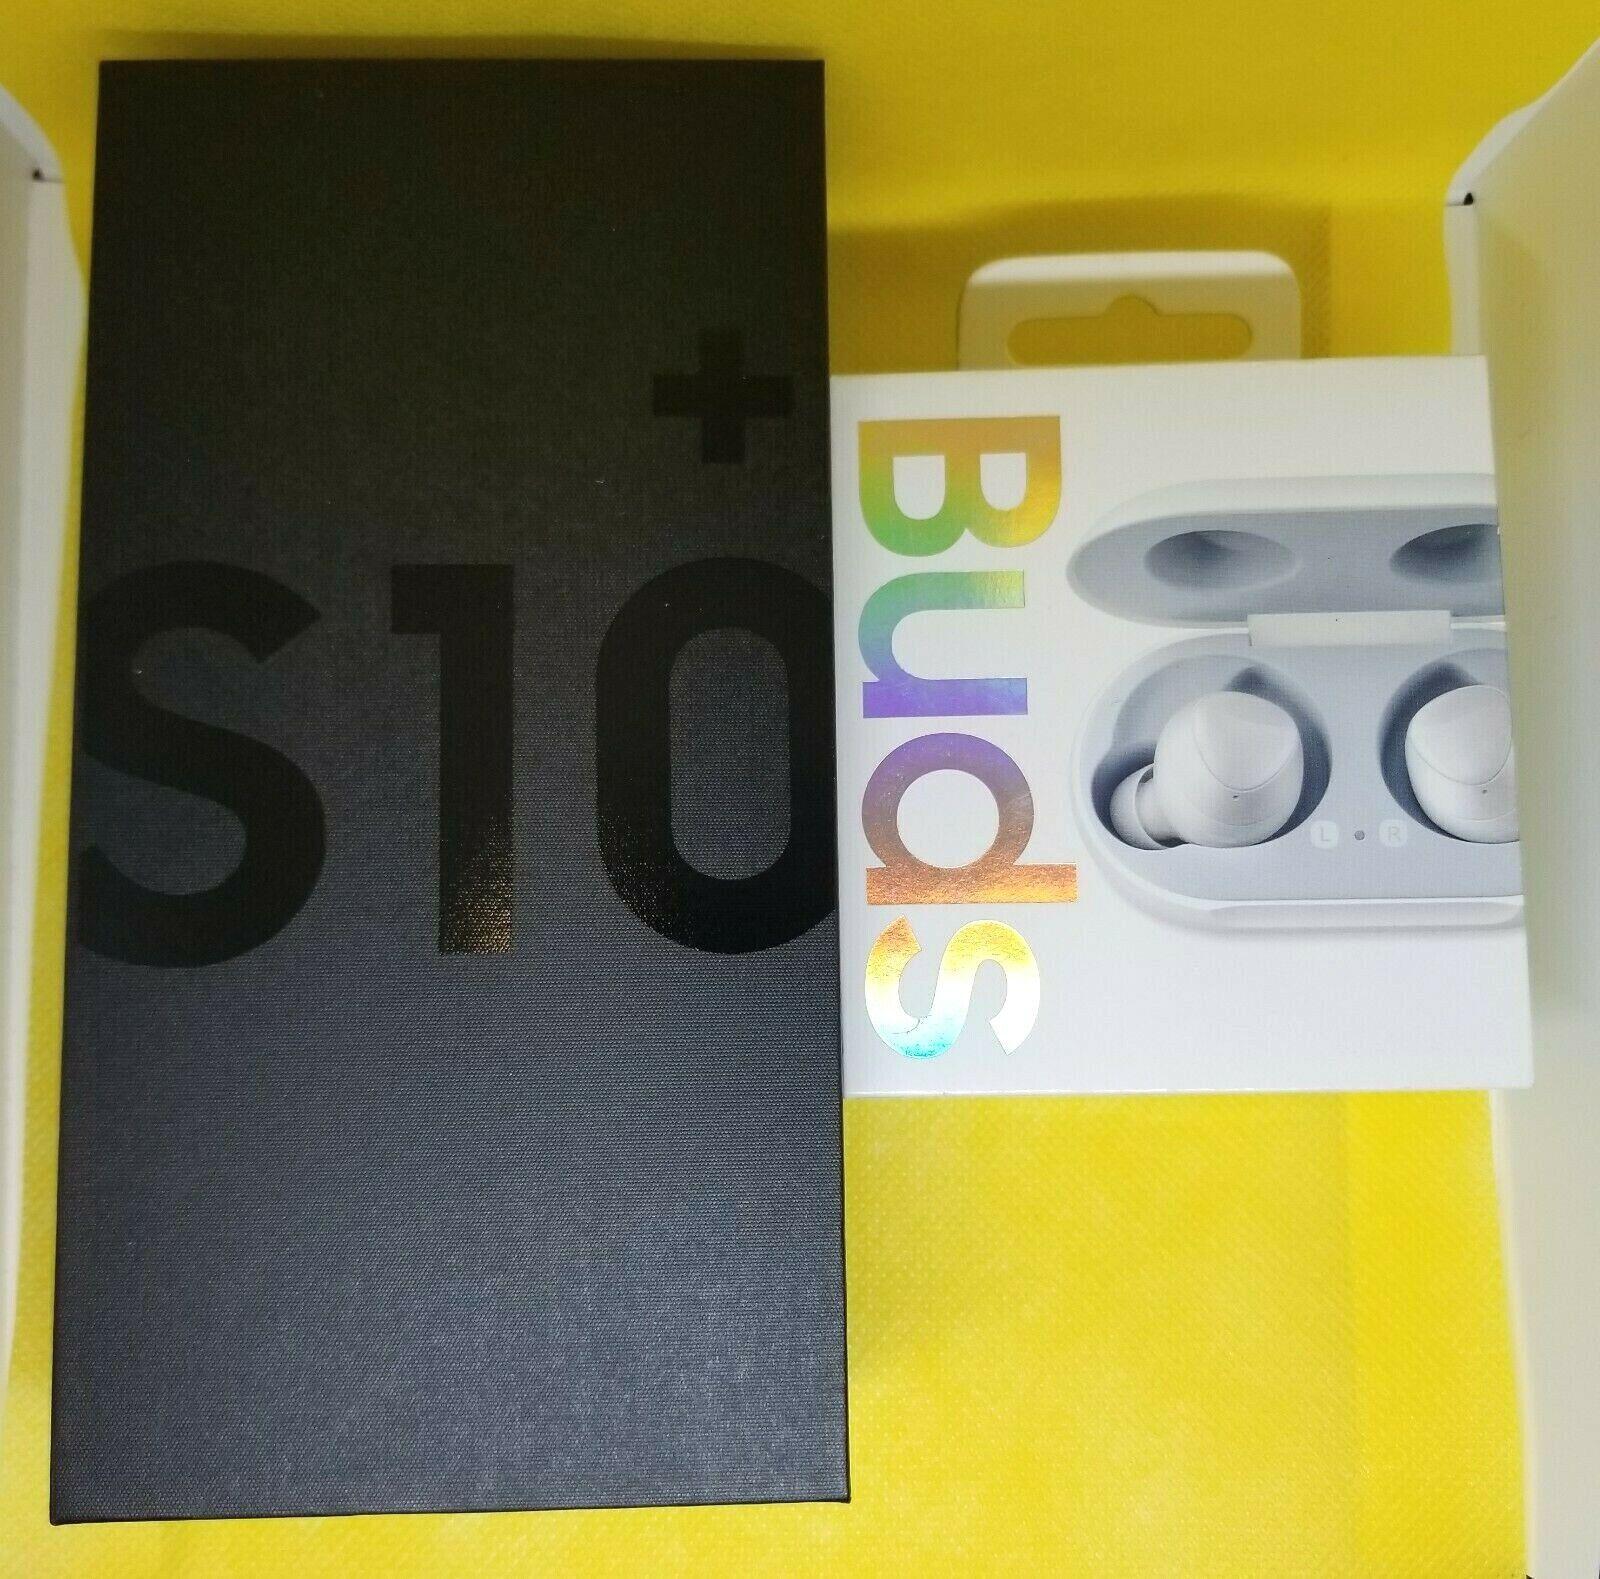 BRAND NEW Samsung Galaxy S10+ Plus SM-G975U - 128GB - Unlocked - BUNDLE DEAL